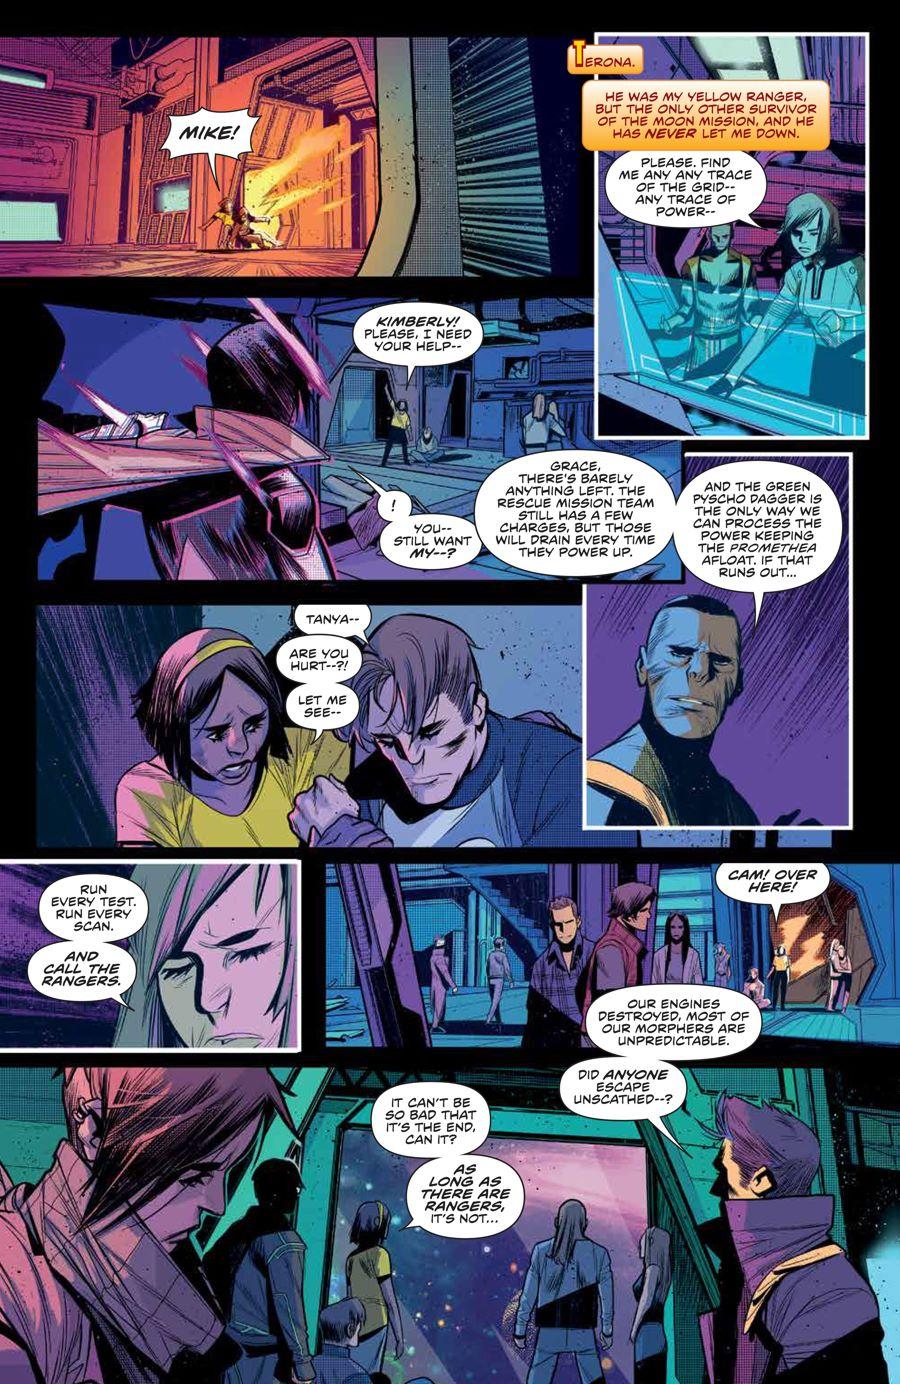 MMPR_BeyondGrid_SC_PRESS_16 ComicList Previews: MIGHTY MORPHIN POWER RANGERS BEYOND THE GRID TP